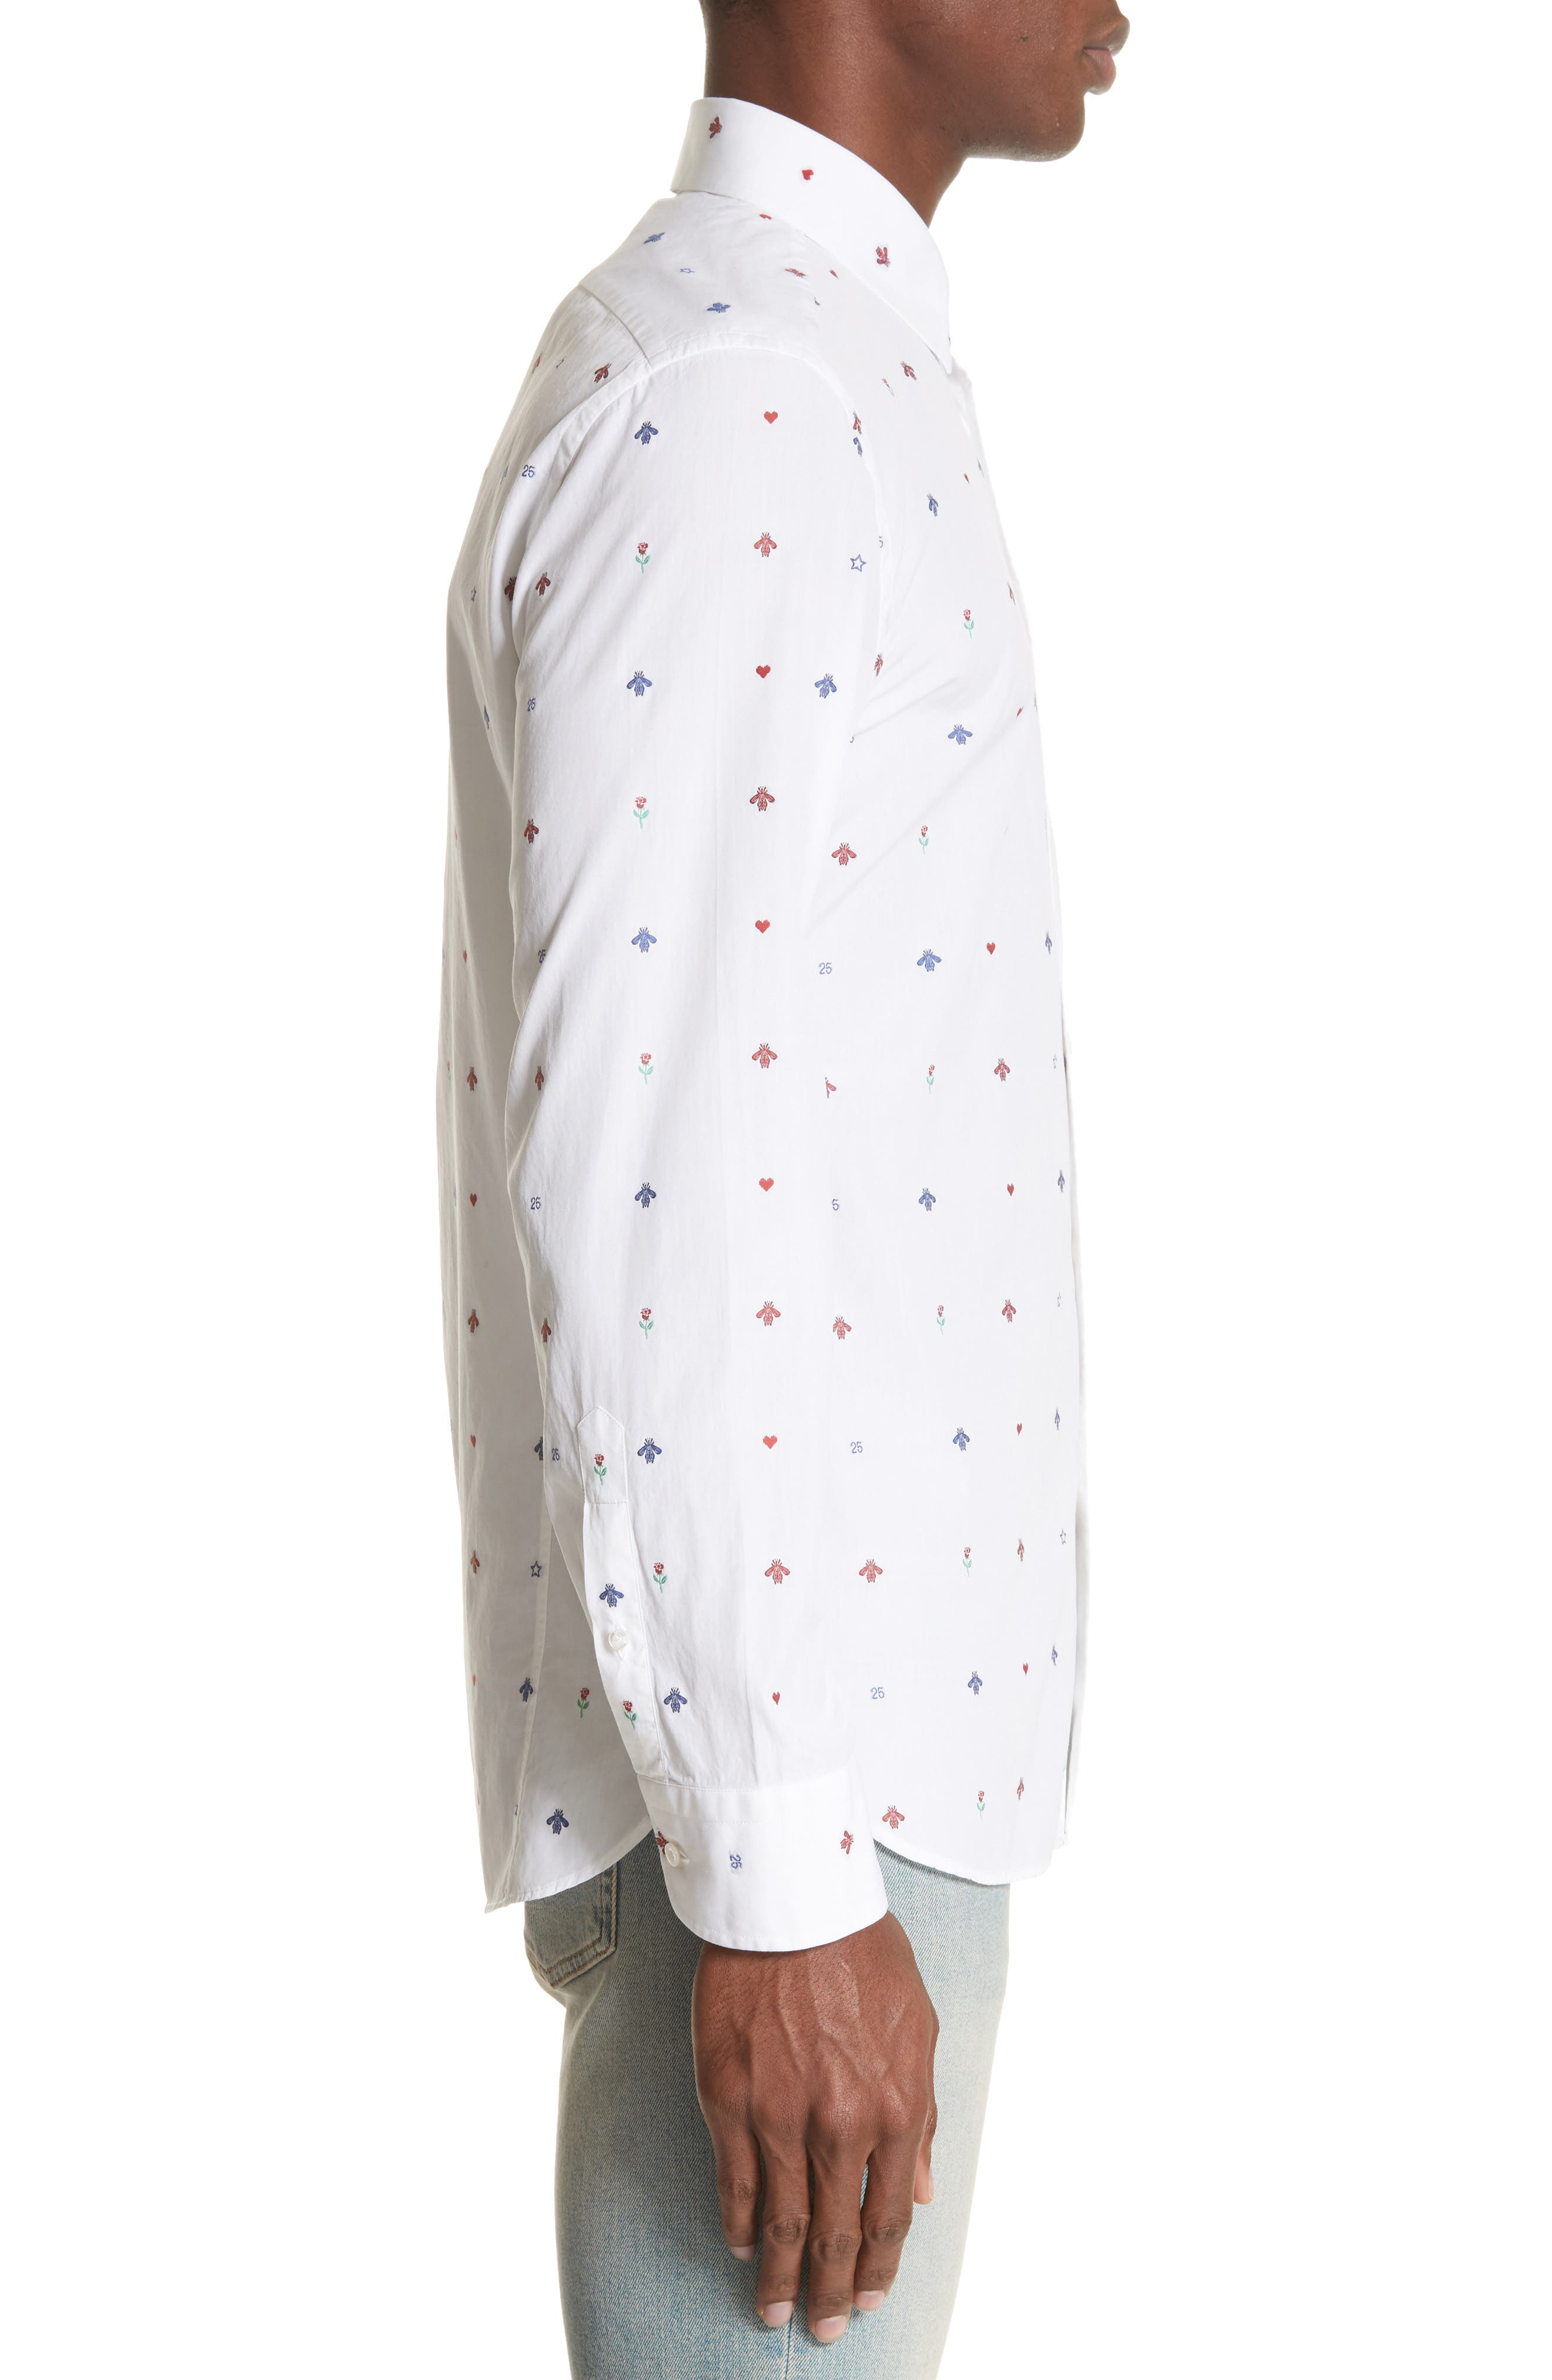 Allover Bee Print Woven Shirt,                             Alternate thumbnail 4, color,                             9000 White